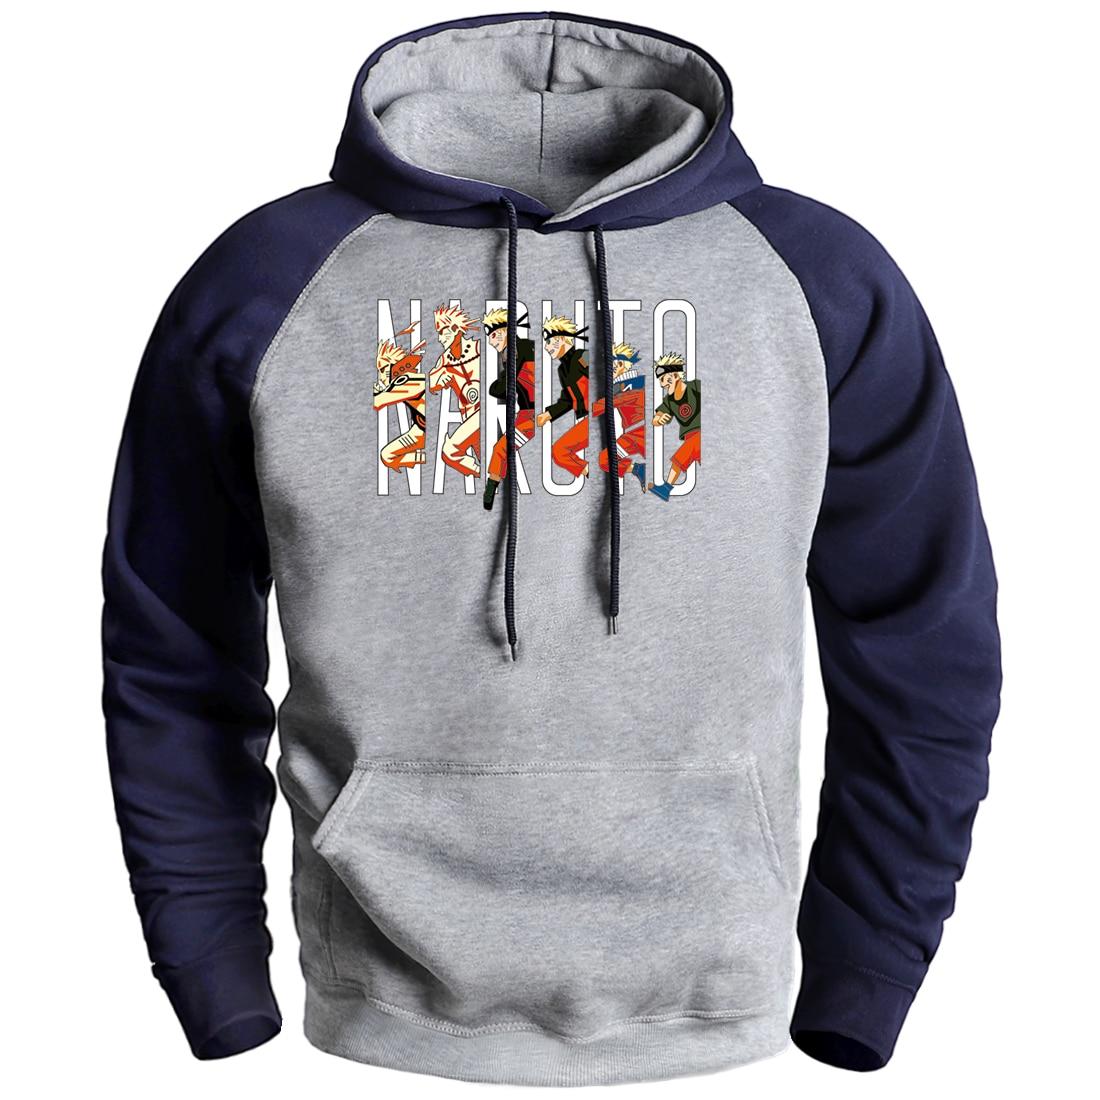 Naruto Sweatshirts Cartoon Naruto Hoodies Pullover Mens Autumn Winter Fleece Hooded Tracksuit Streetwear 2020 Fashion Sportswear